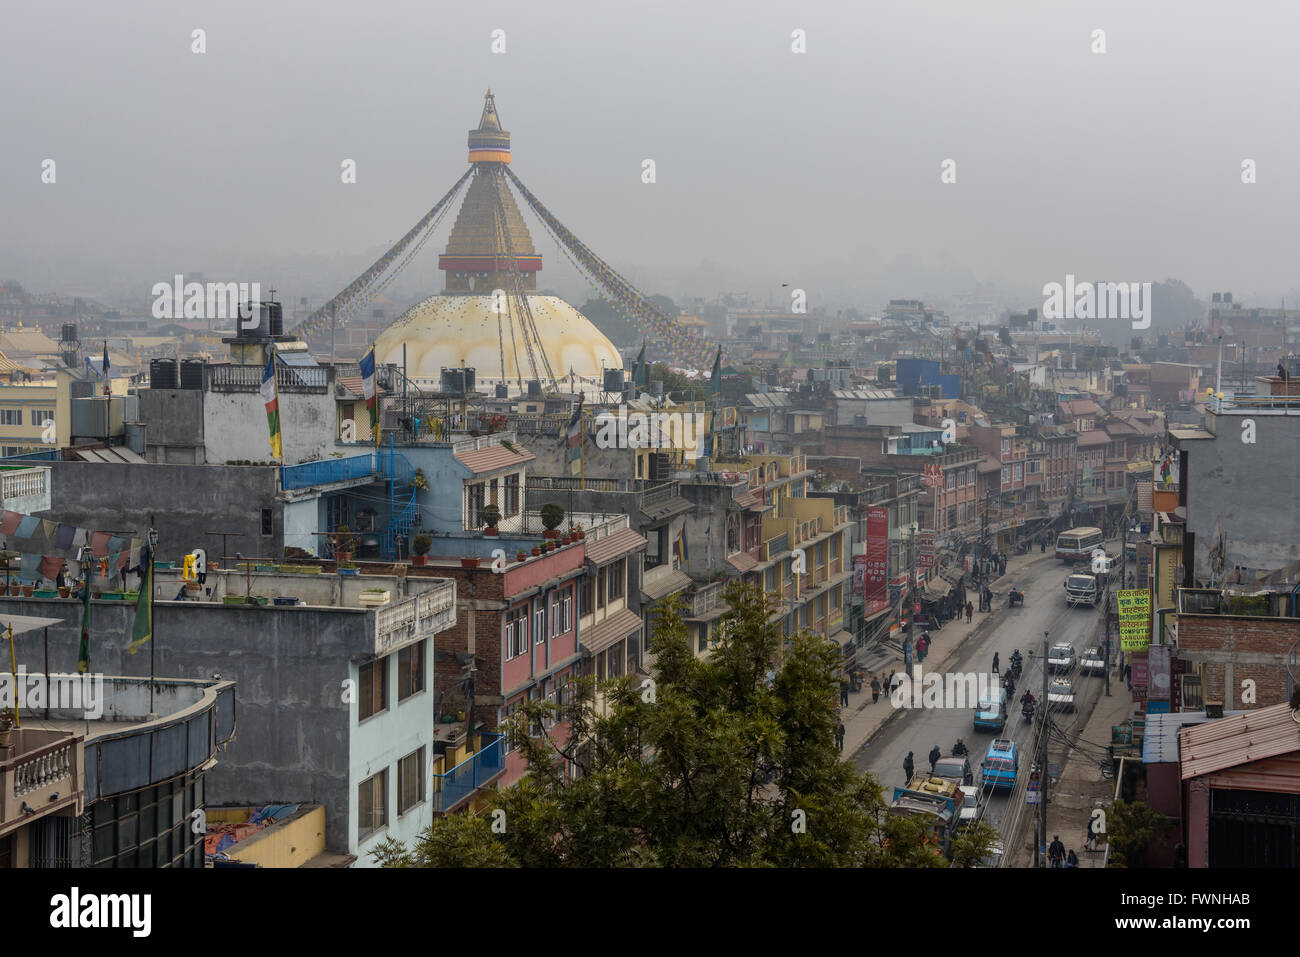 Boudhanath stupa, a UNESCO World Heritage Site circa December 2013 in Kathmandu, Nepal - Stock Image